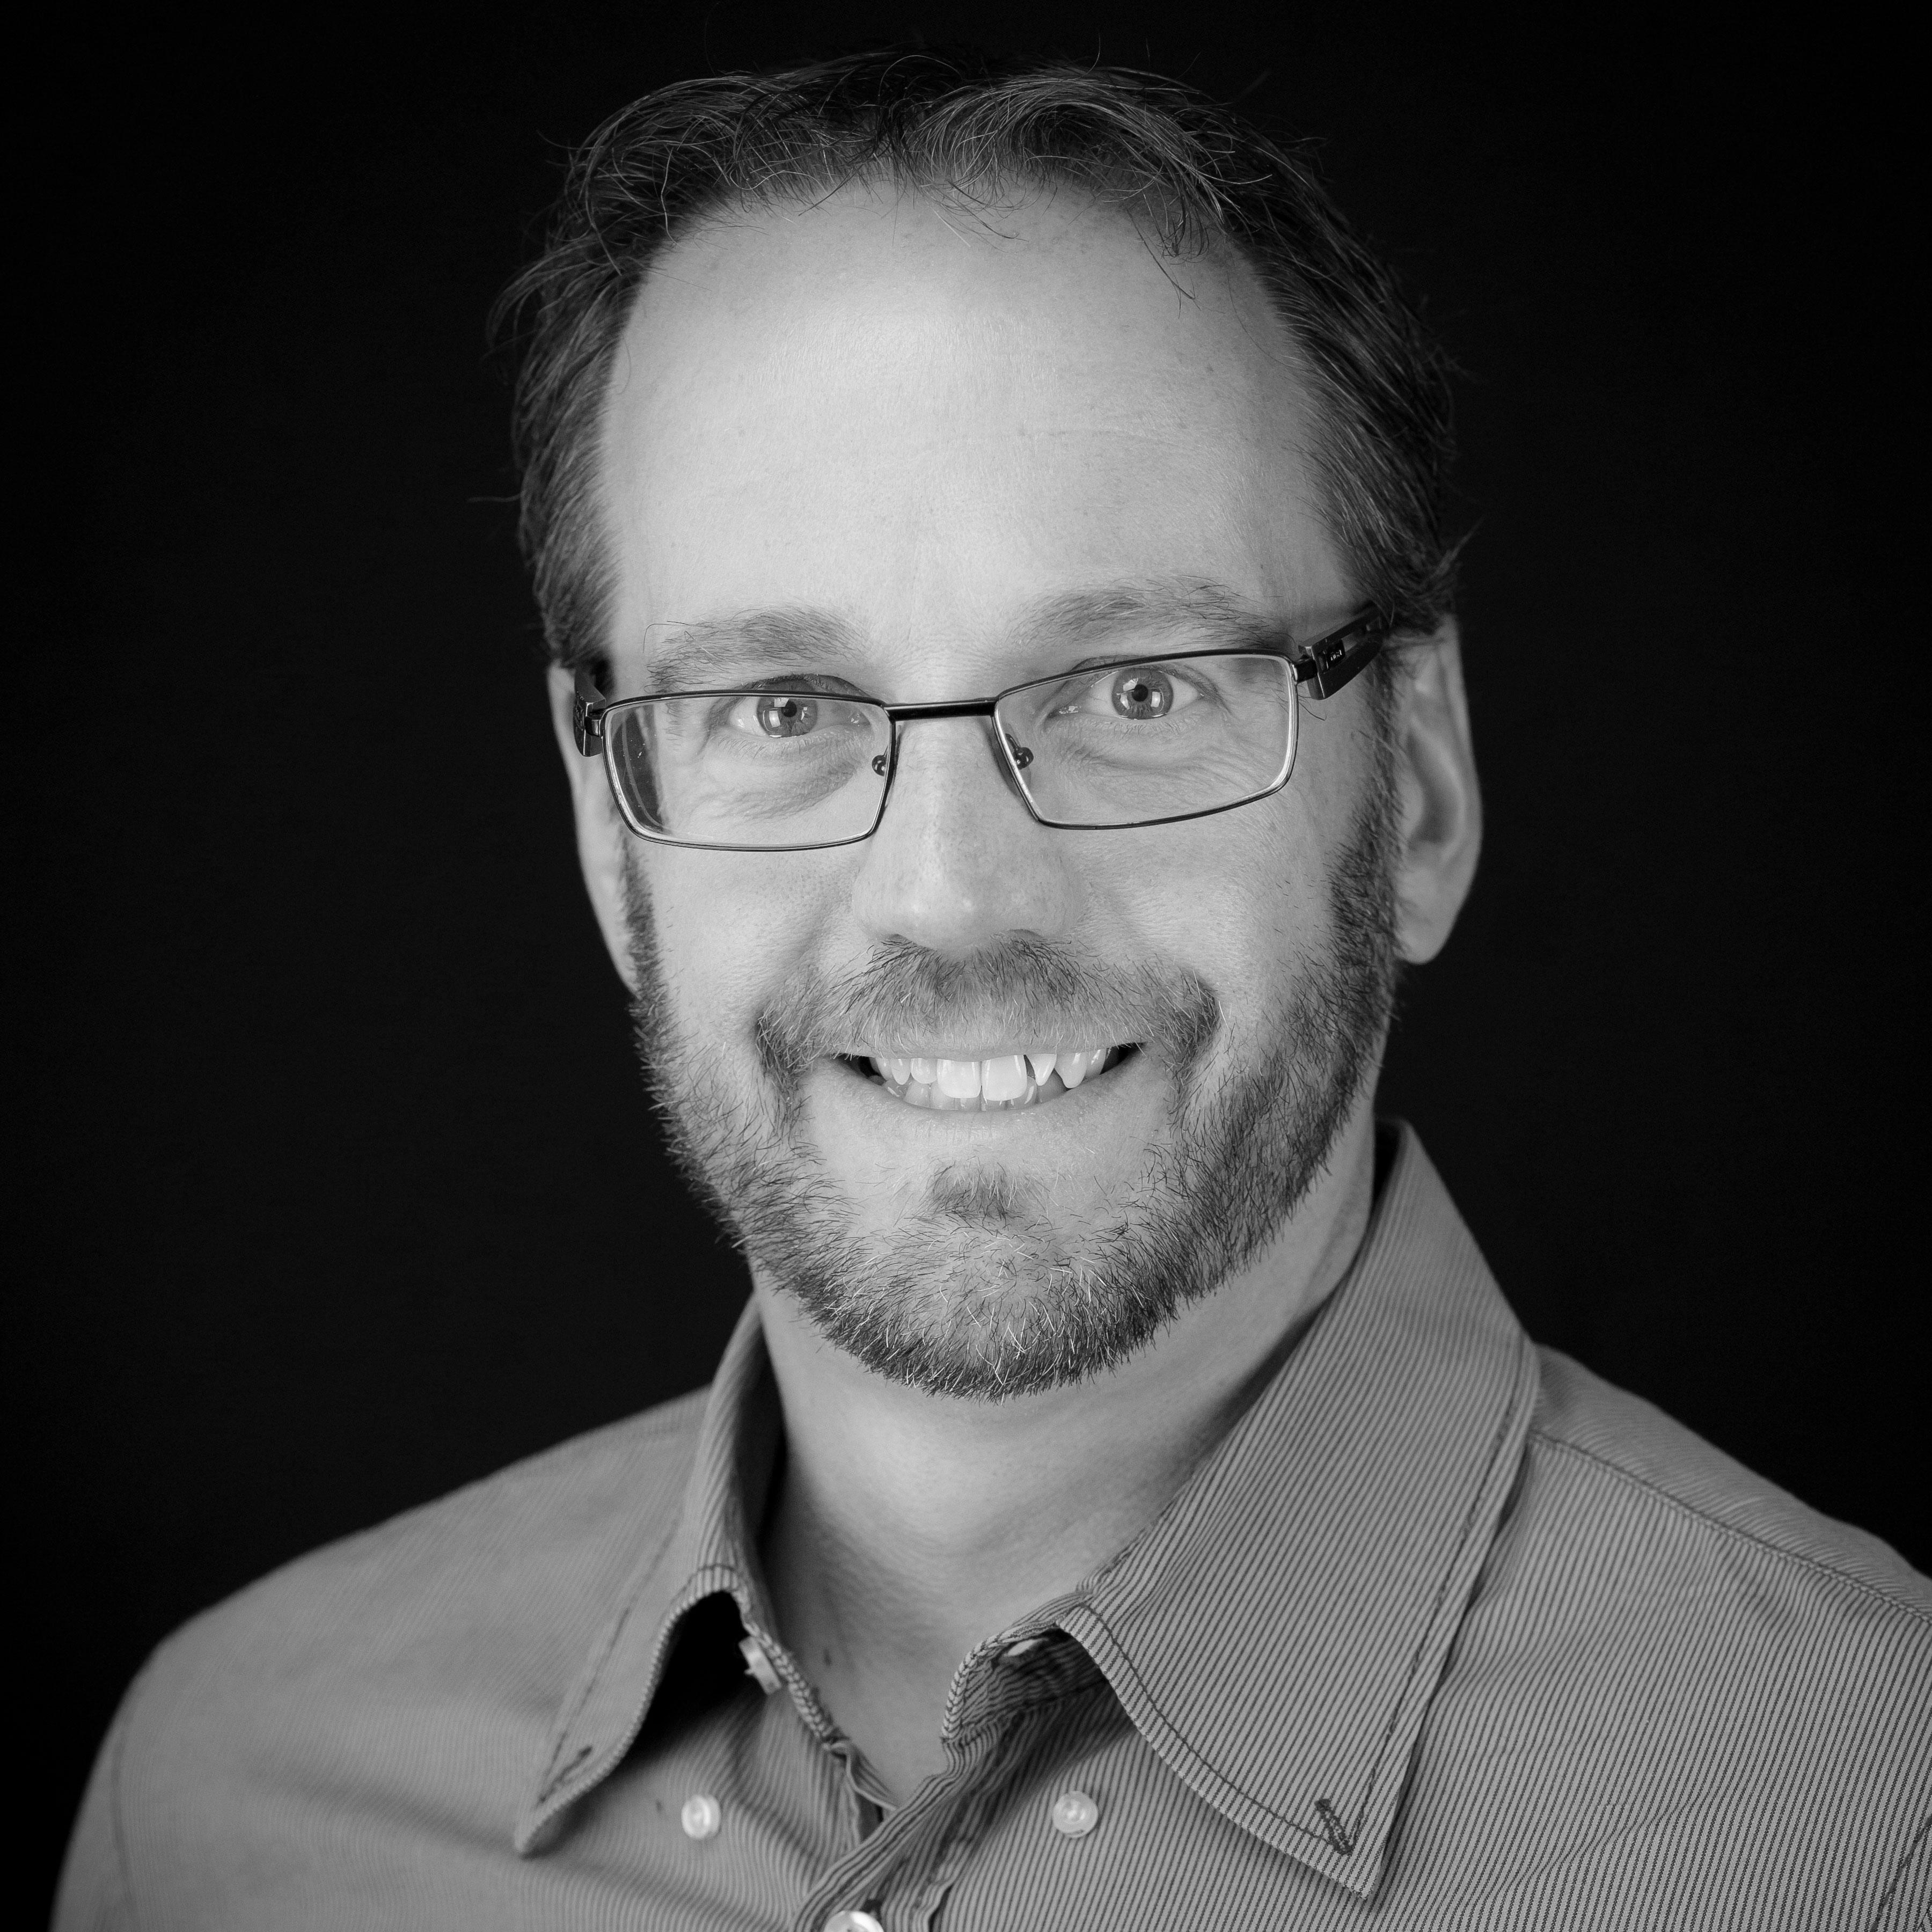 Johannes Angenvoort, Garmin Employee